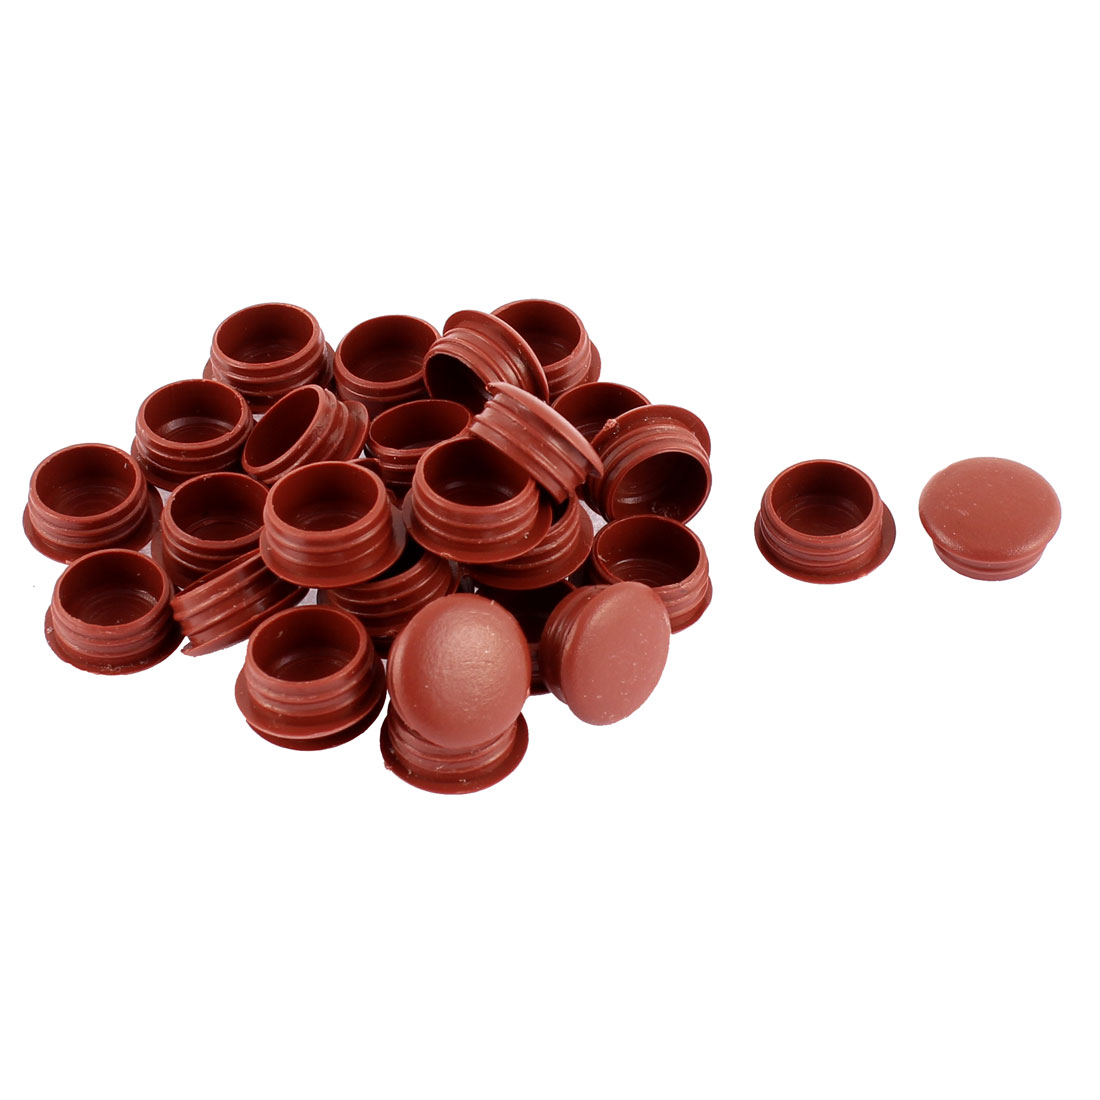 Plastic Flush Type Hole Caps Covers Tube Insert Burgundy 15mm Diameter 30 Pcs